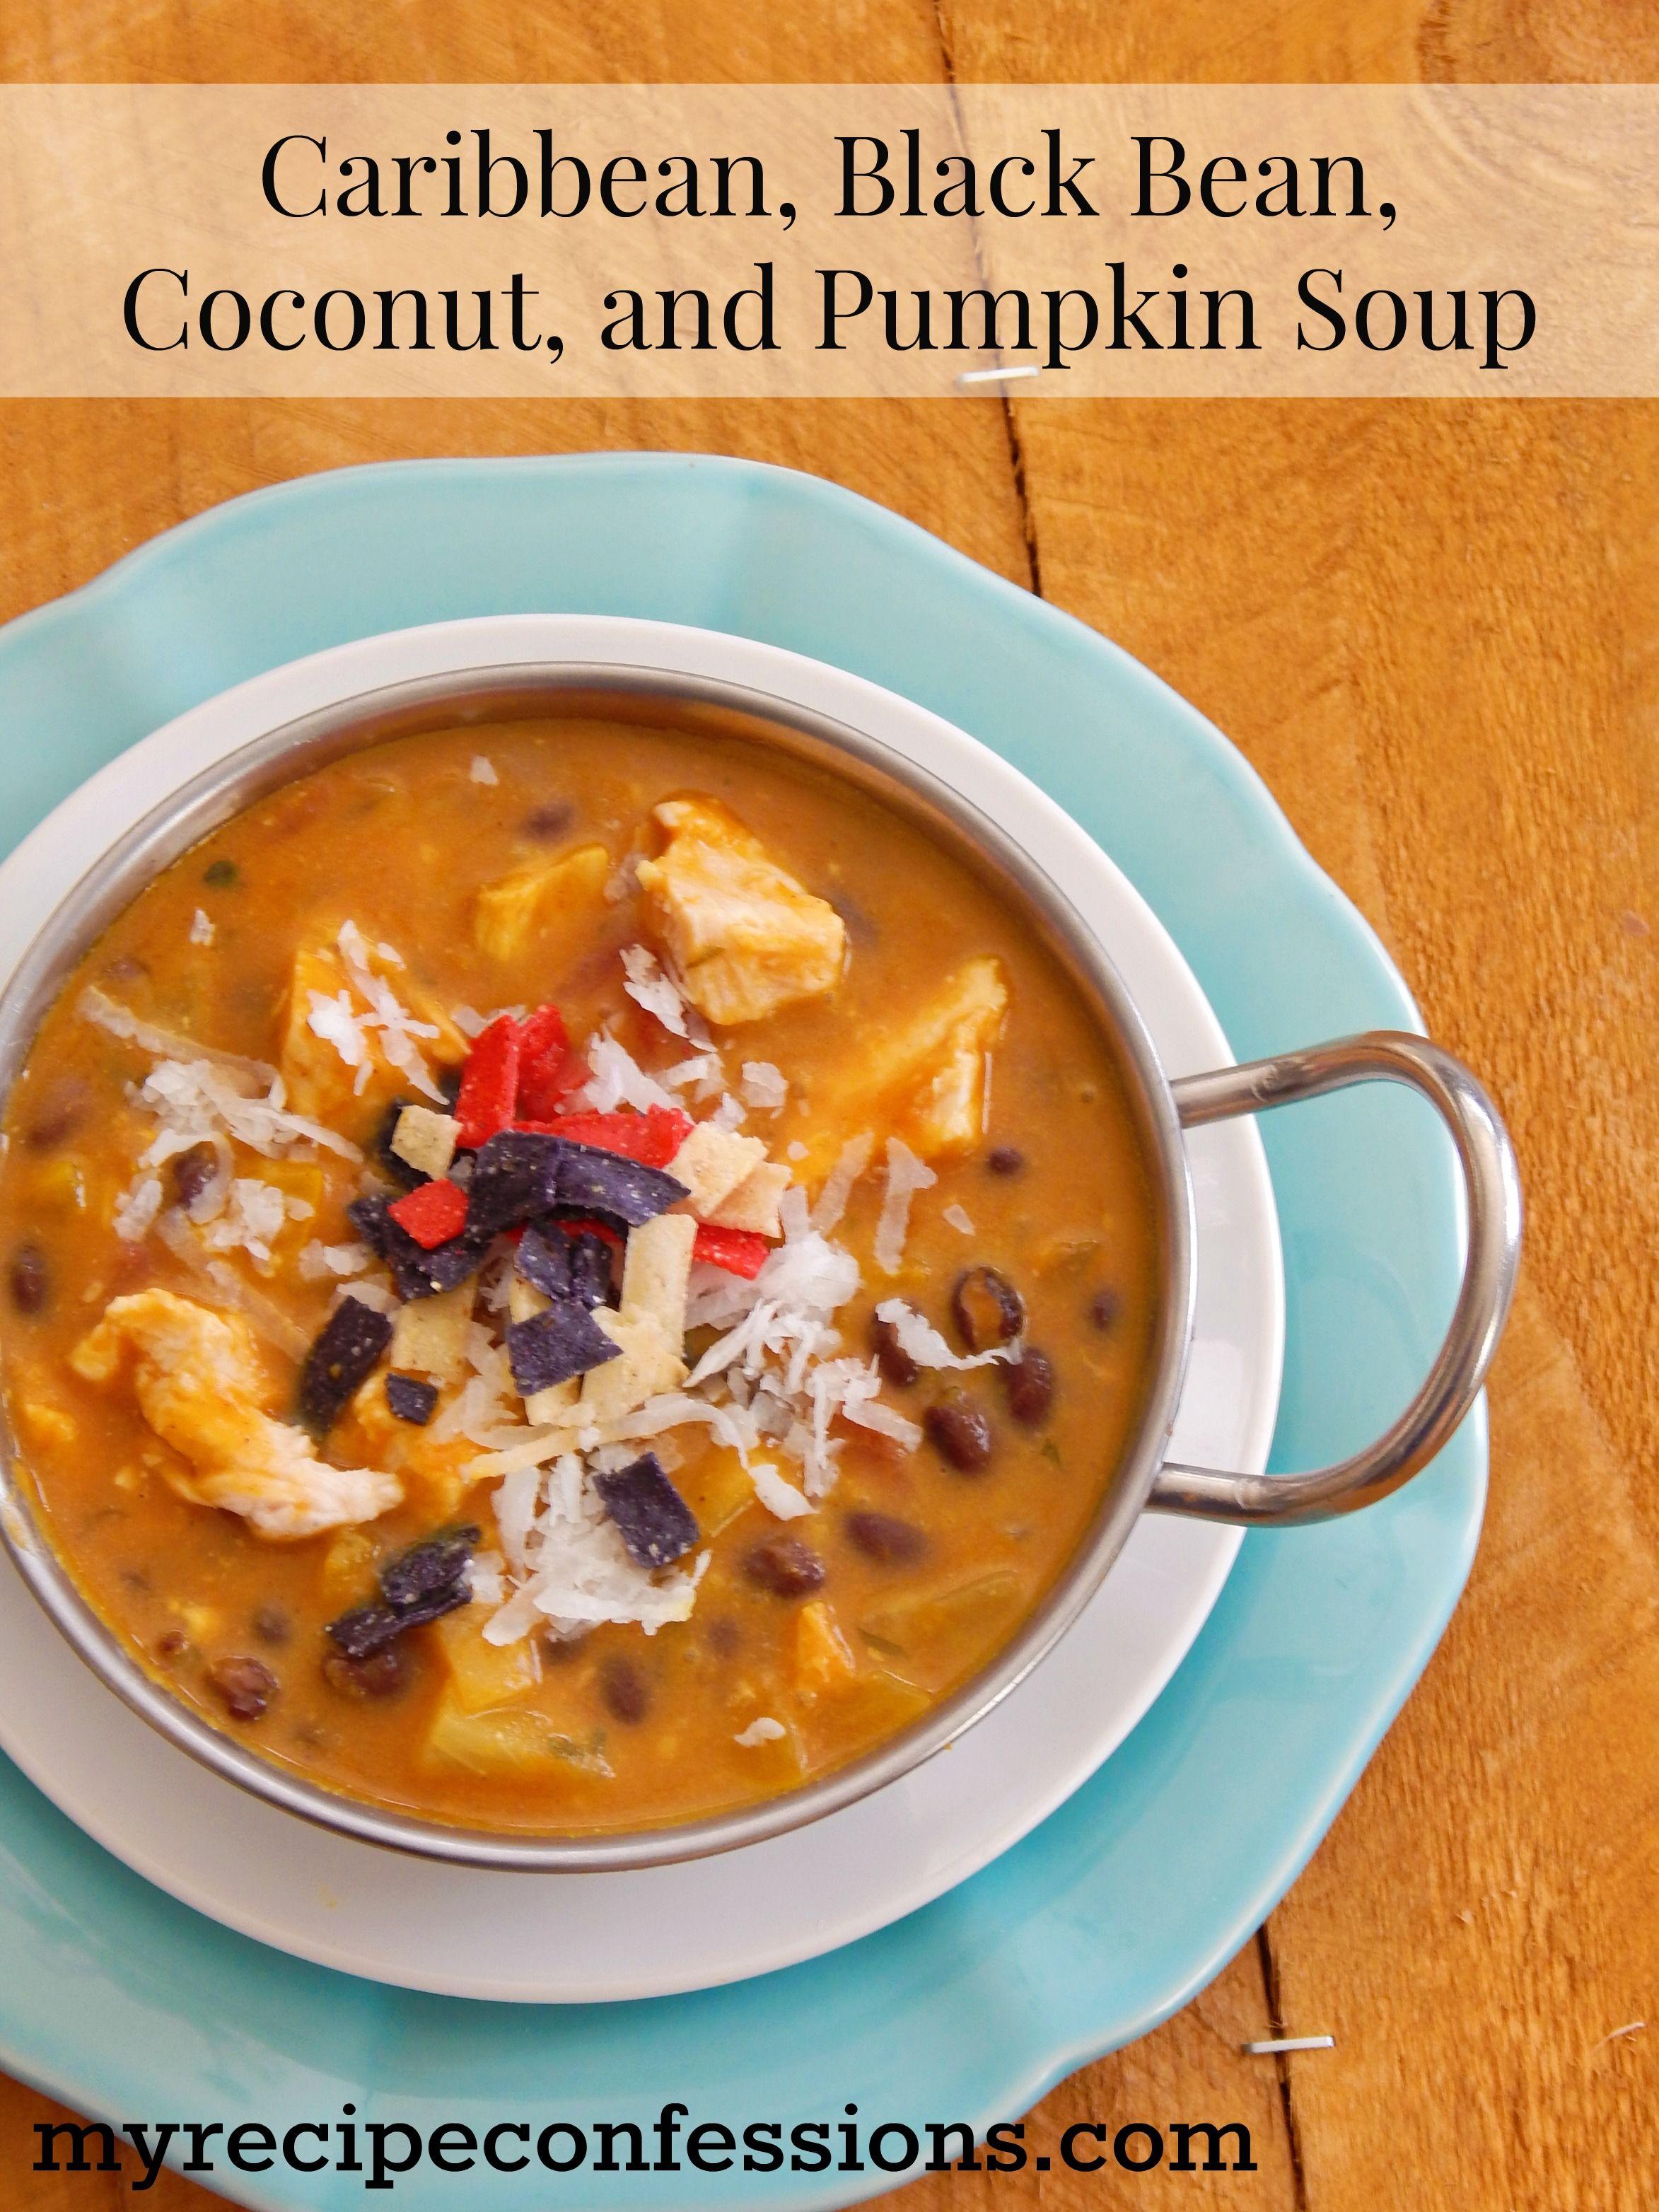 Genius: This Healthy Soup Recipe Requires Next to NoCooking Genius: This Healthy Soup Recipe Requires Next to NoCooking new photo